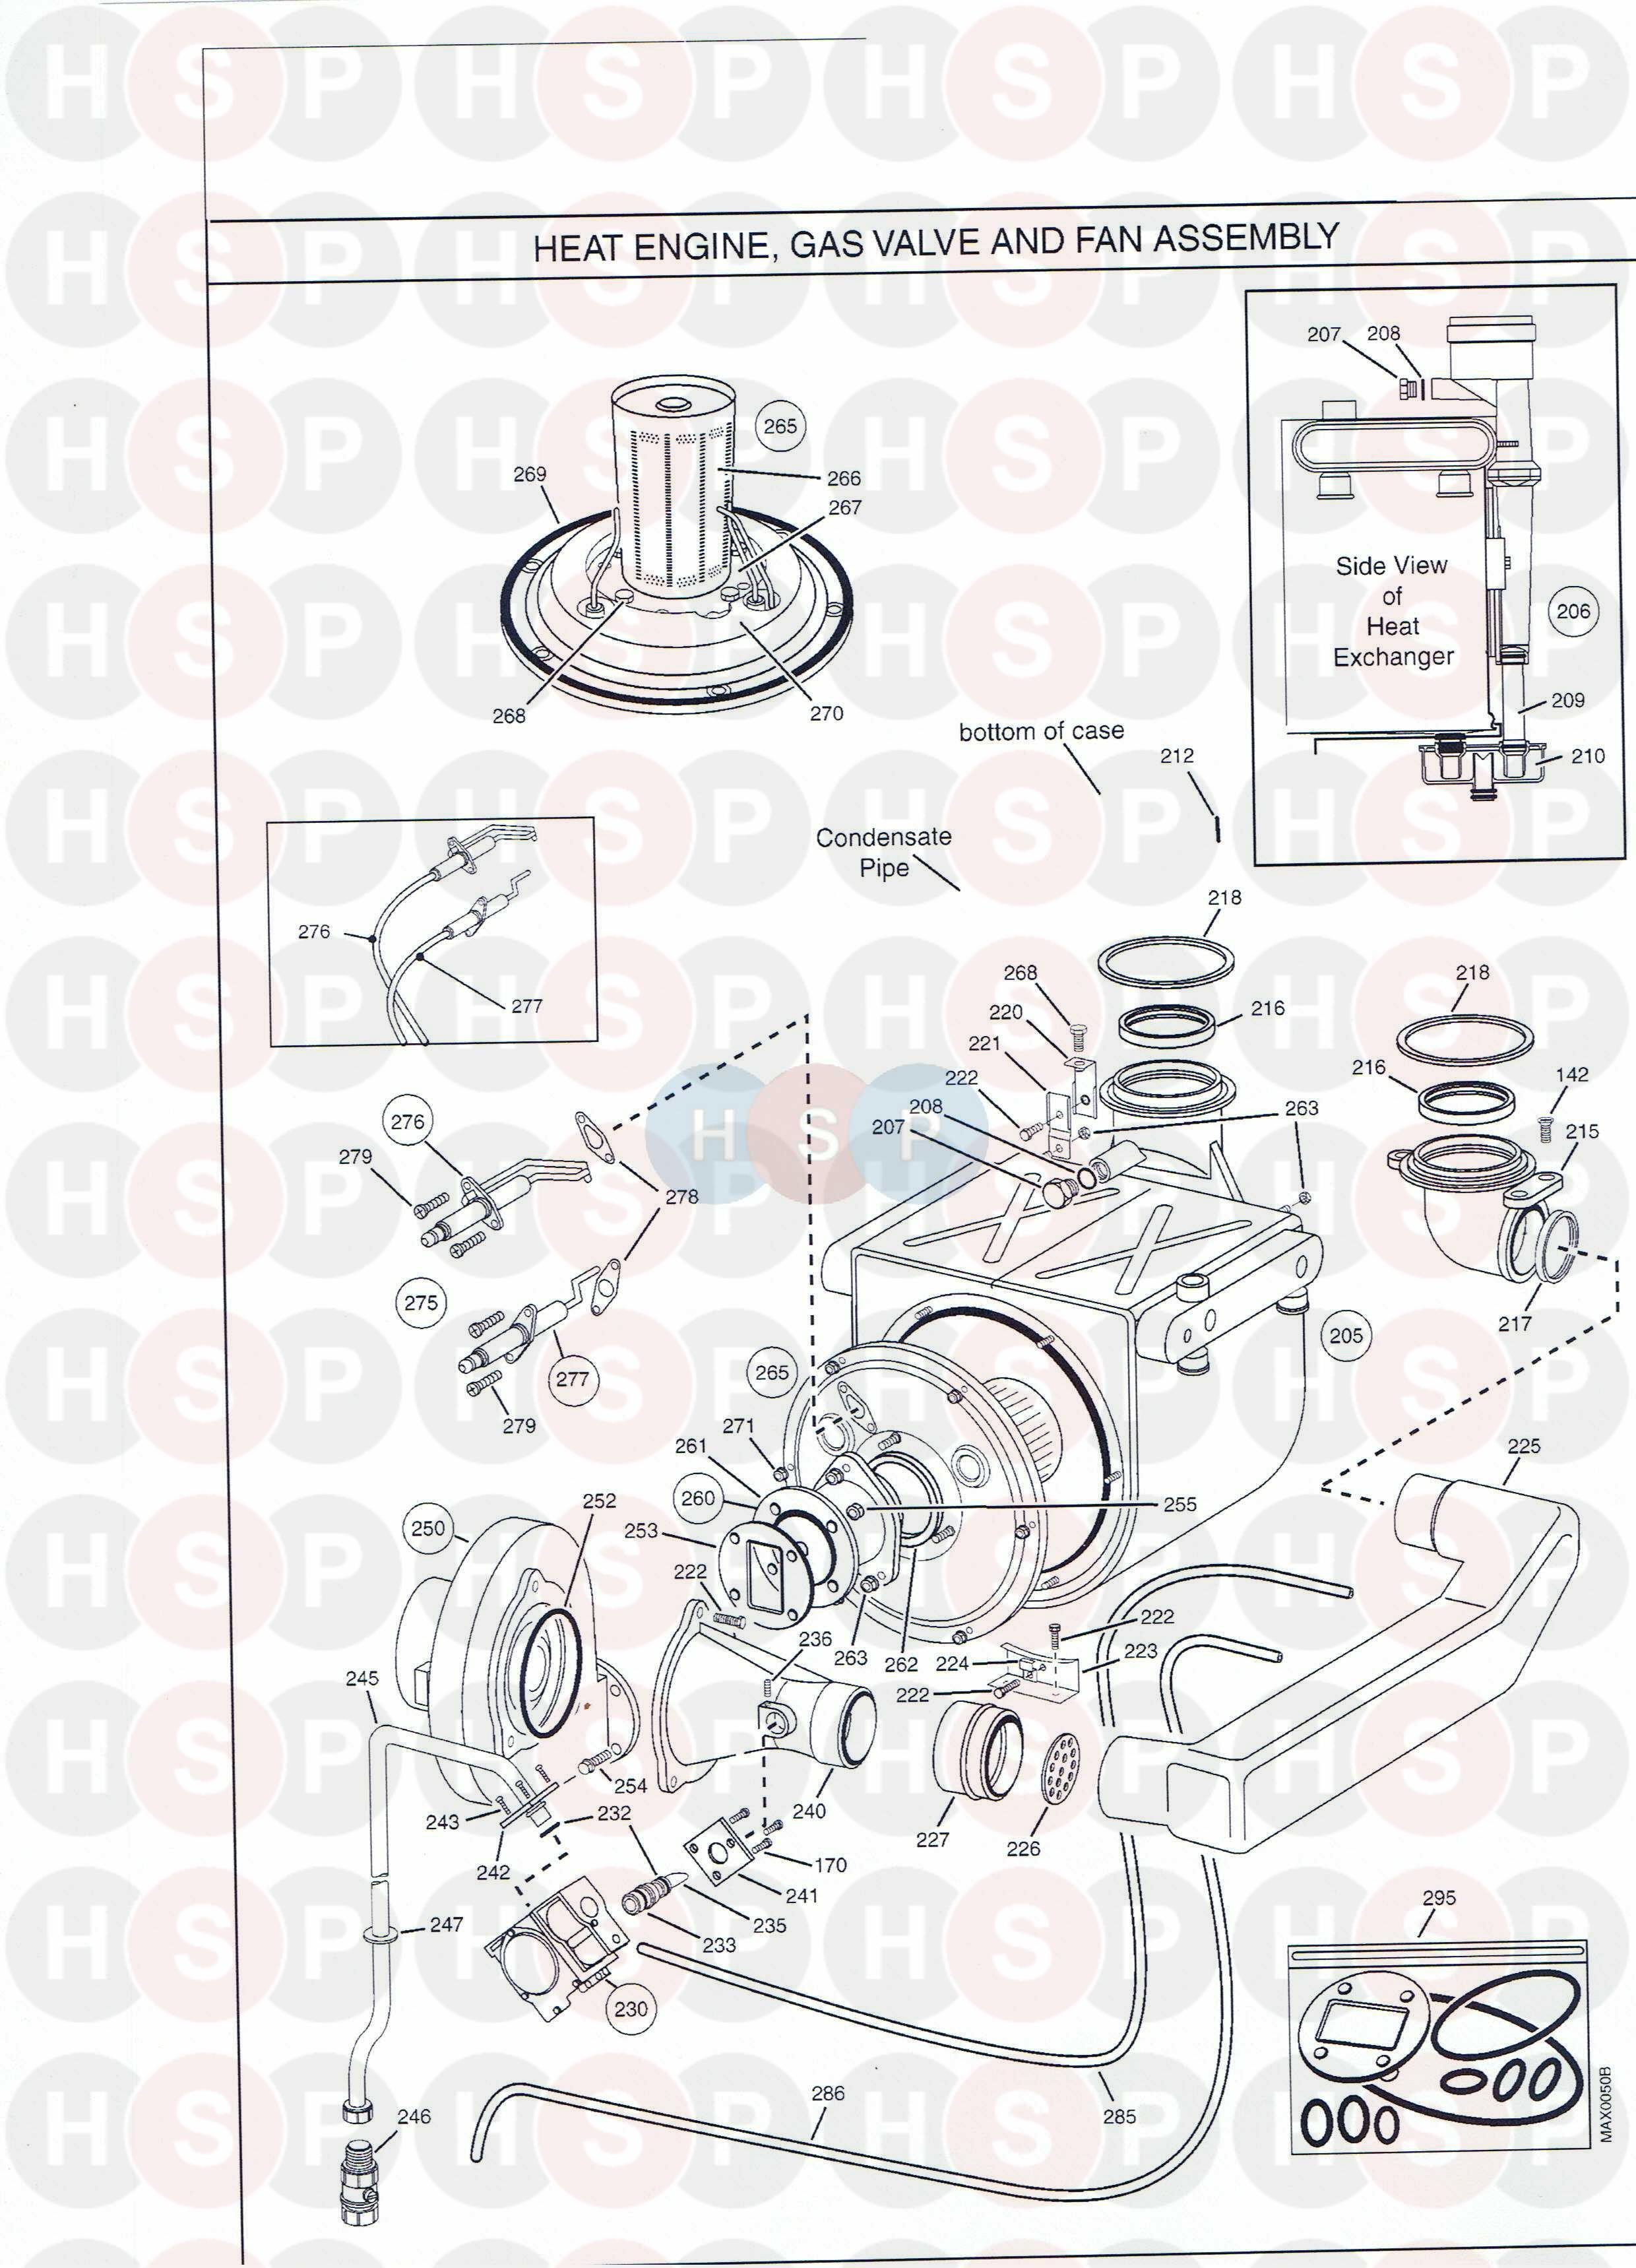 potterton powermax 85 he appliance diagram  heat engine